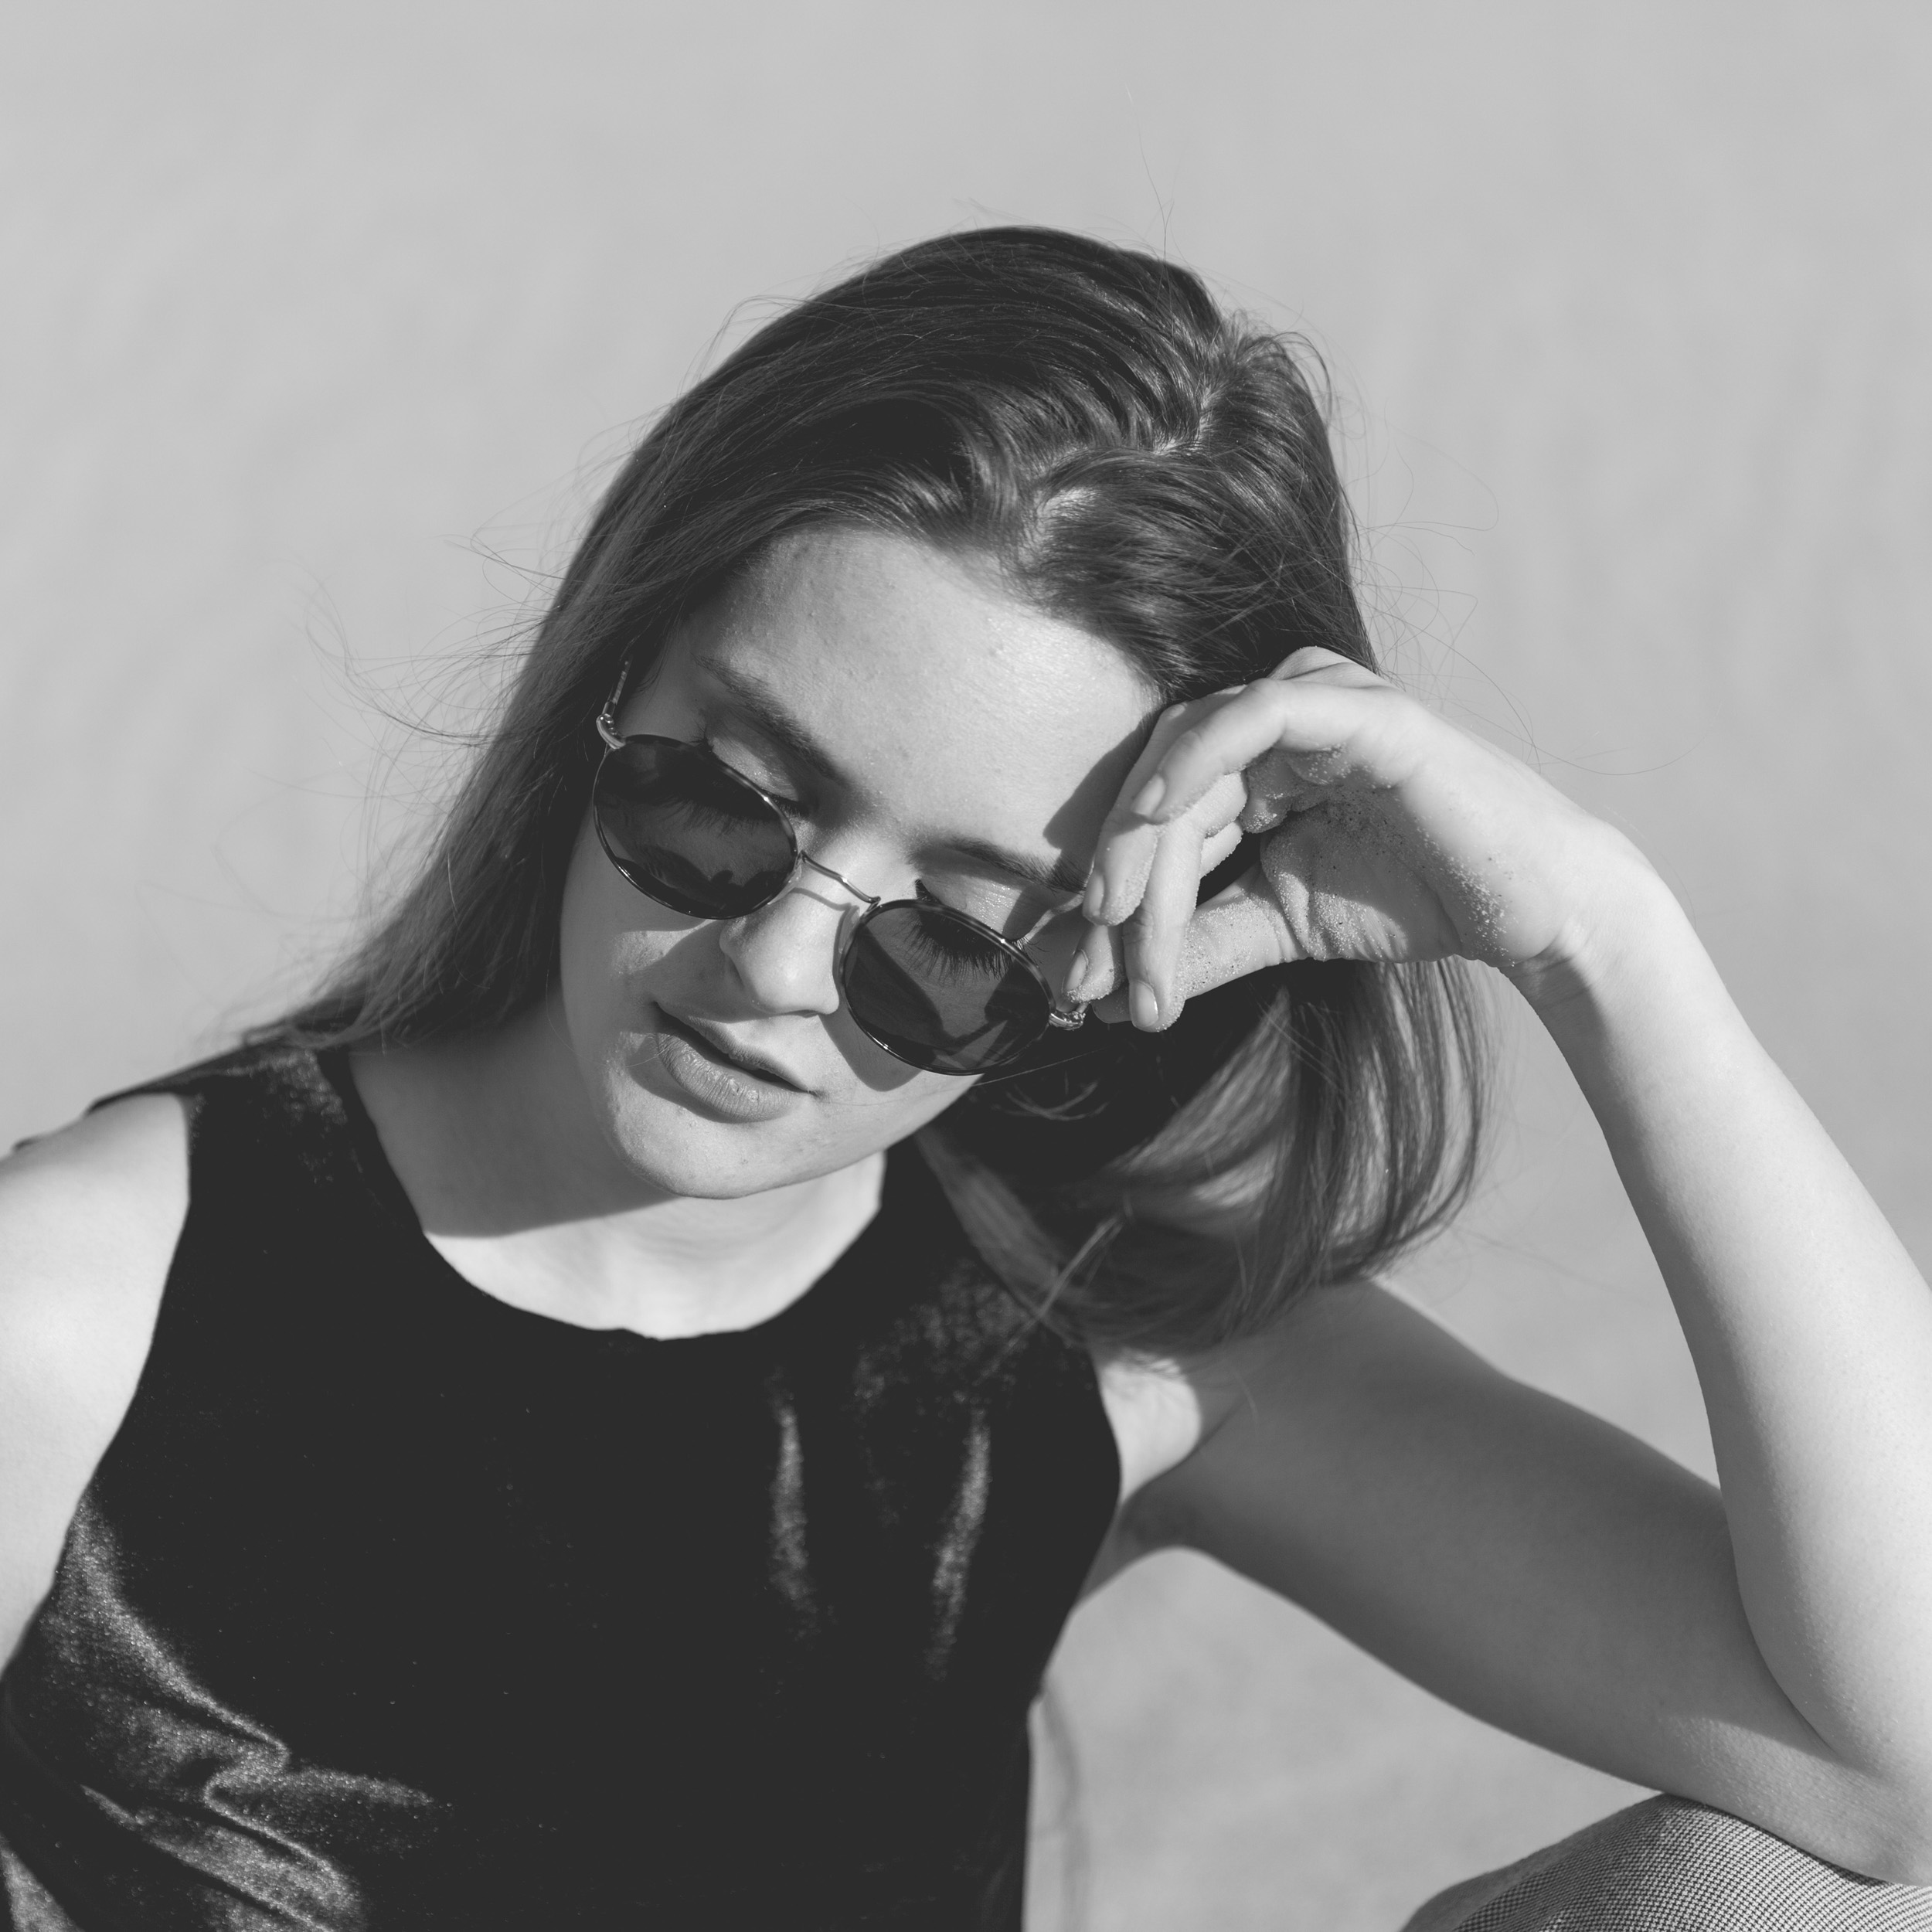 Henrikson-Nicole Horseneck Jpeg FullSized_5.JPG